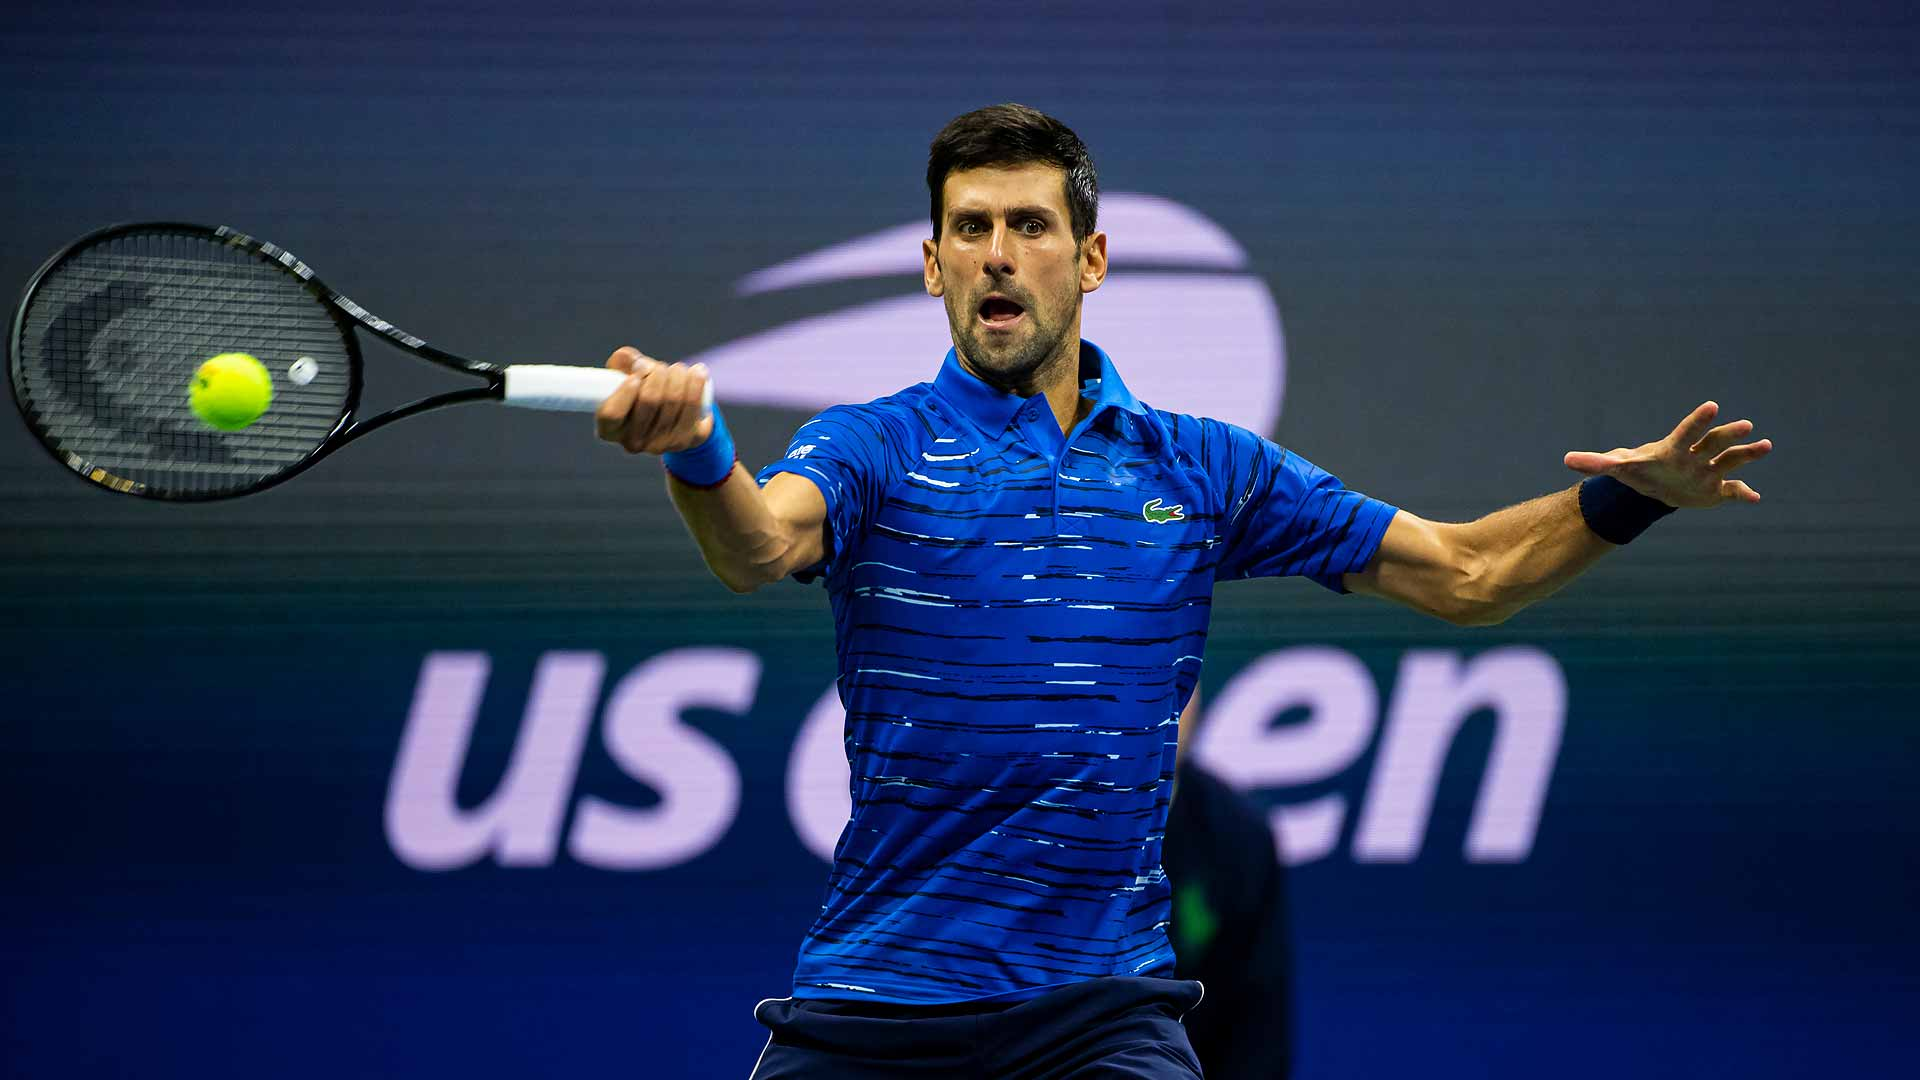 Novak Djokovic Leads Us Open Field Atp Tour Tennis